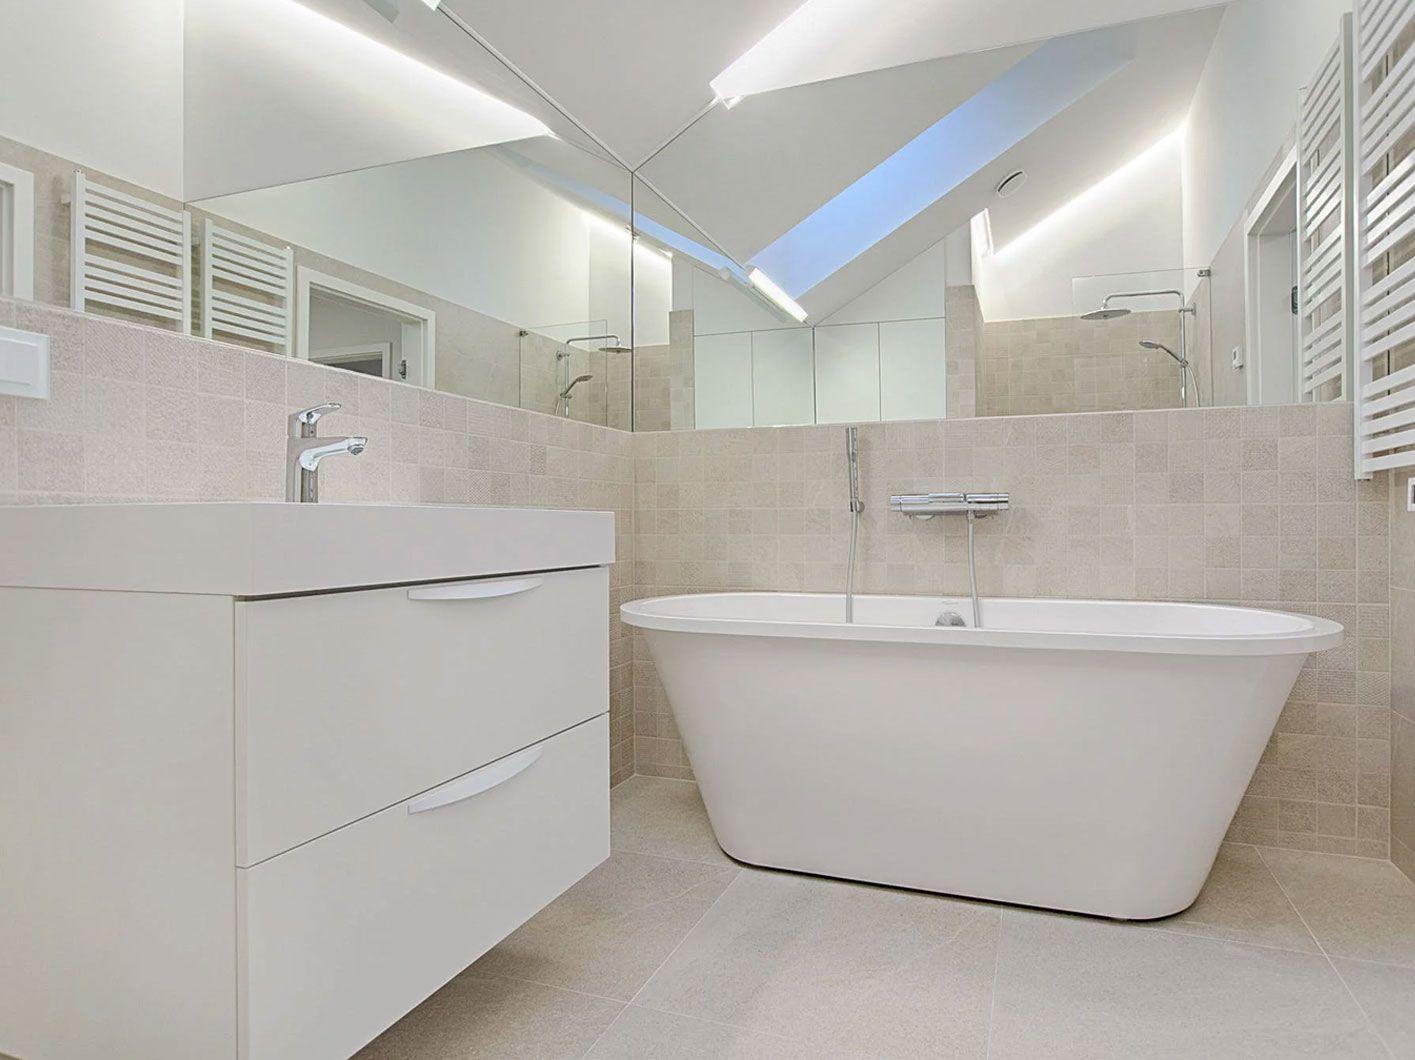 kitchen-bathroom-content-image